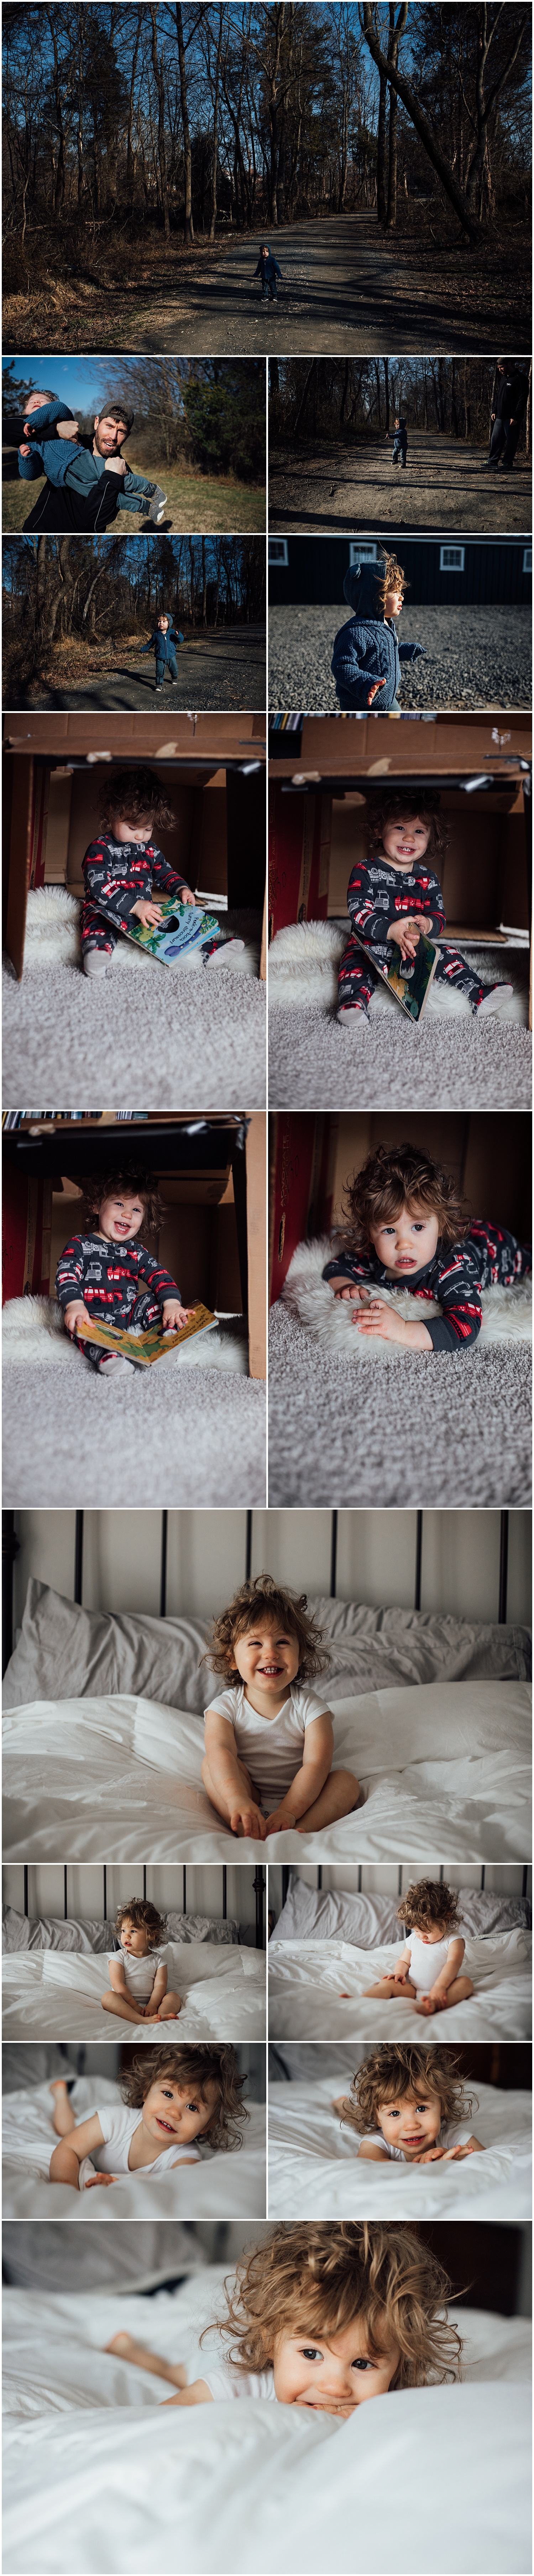 Emotive Northern Virginia family photographer Rachel K Photo